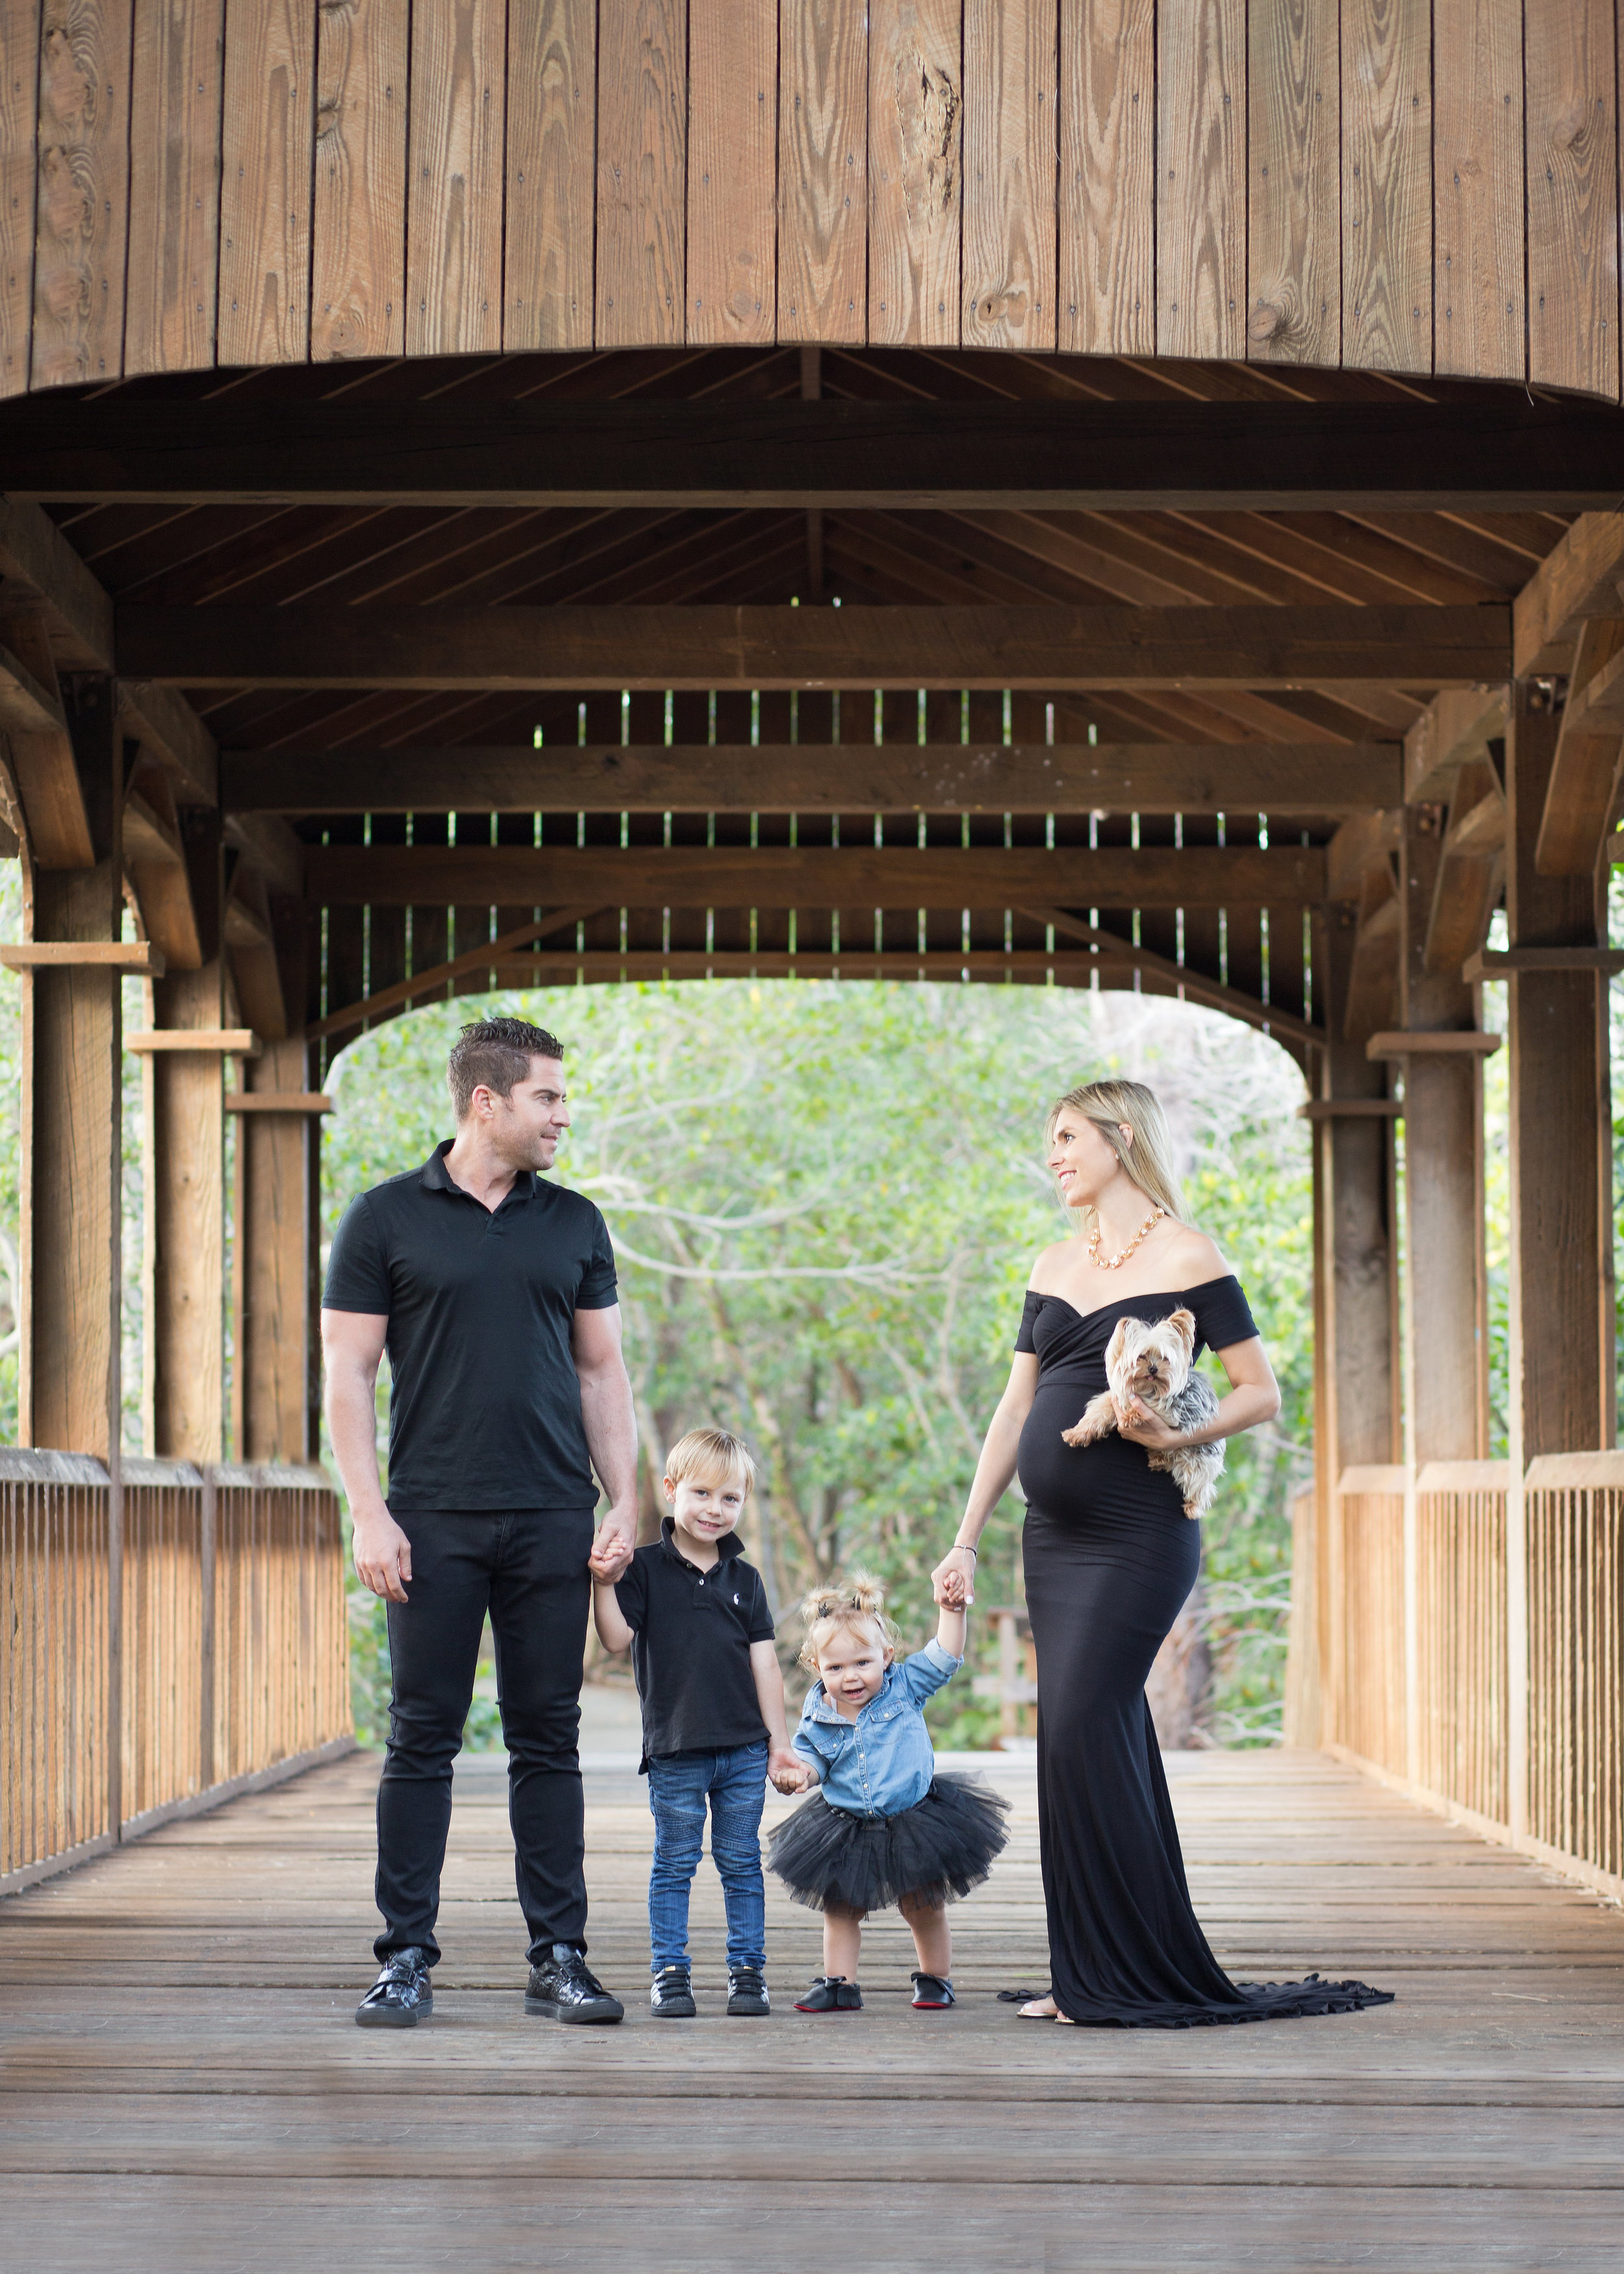 FamilyPhotos2018(4of55).jpg